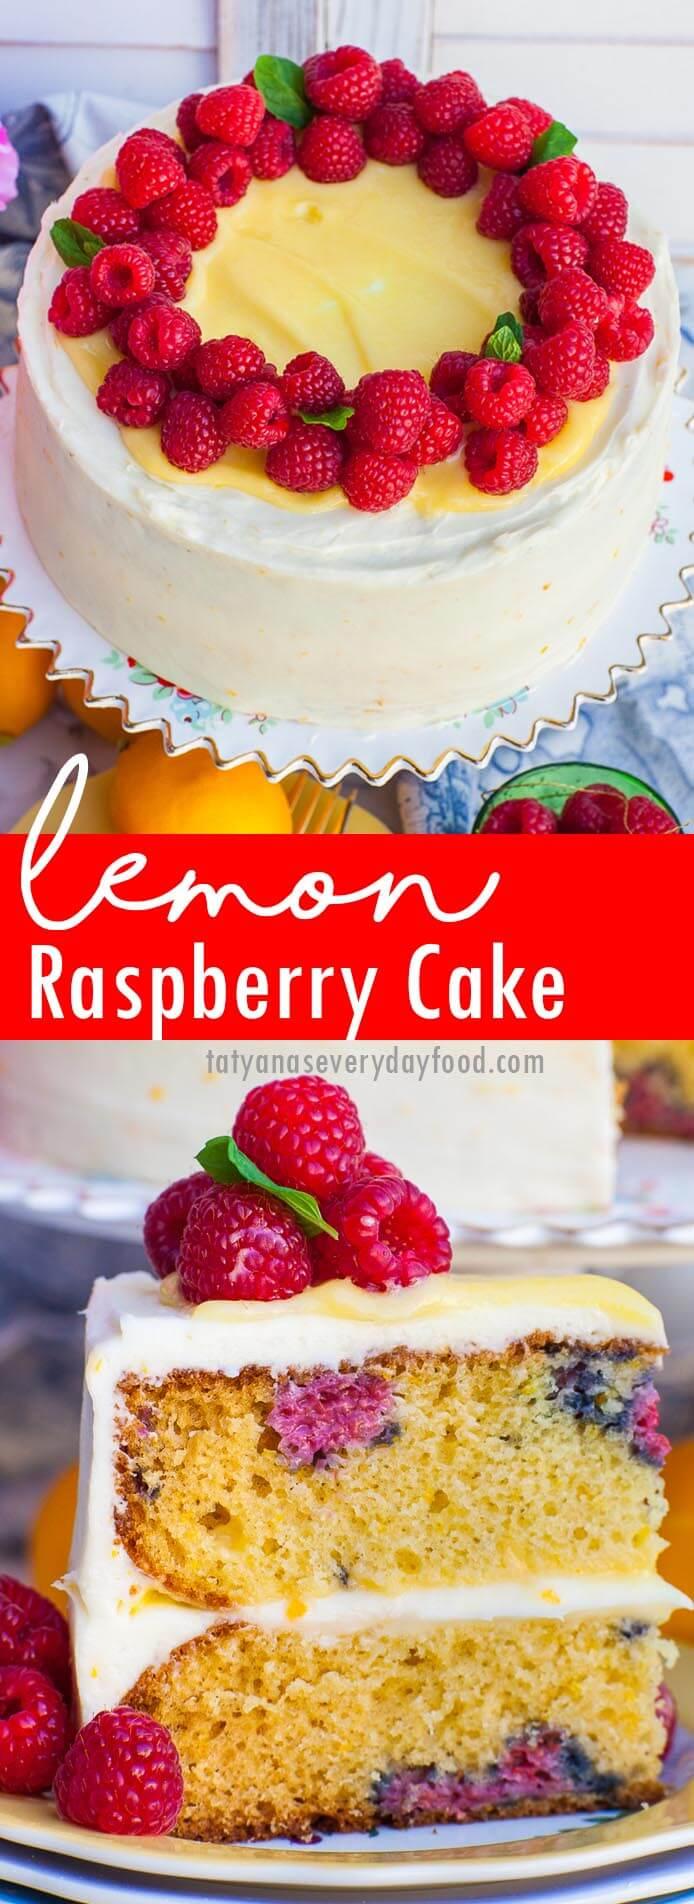 Lemon Raspberry Cake video recipe